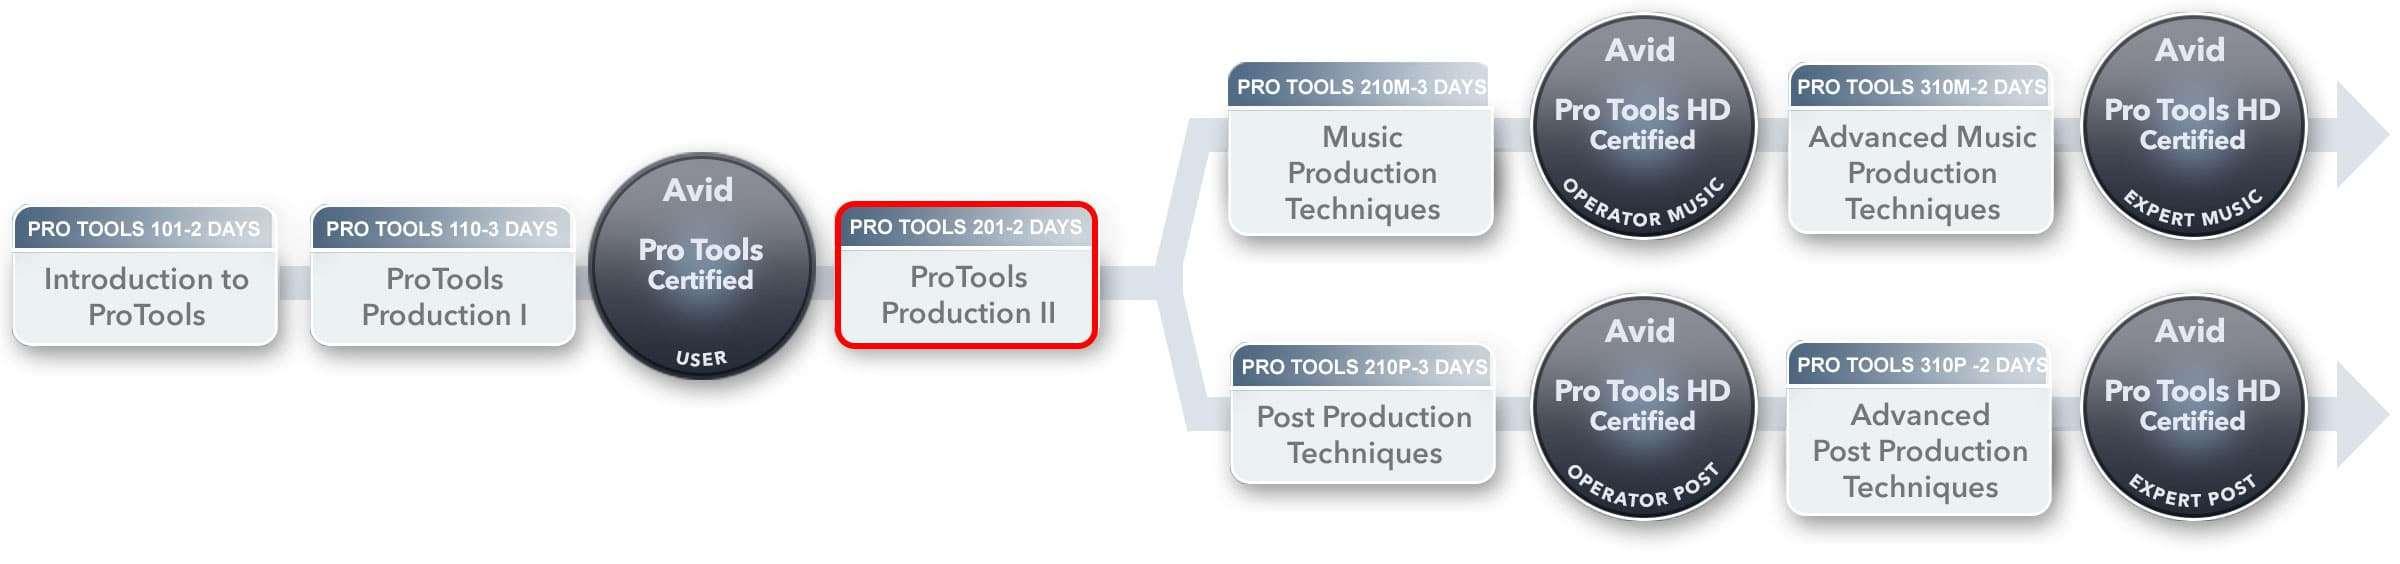 Pro-Tools-path-201-12